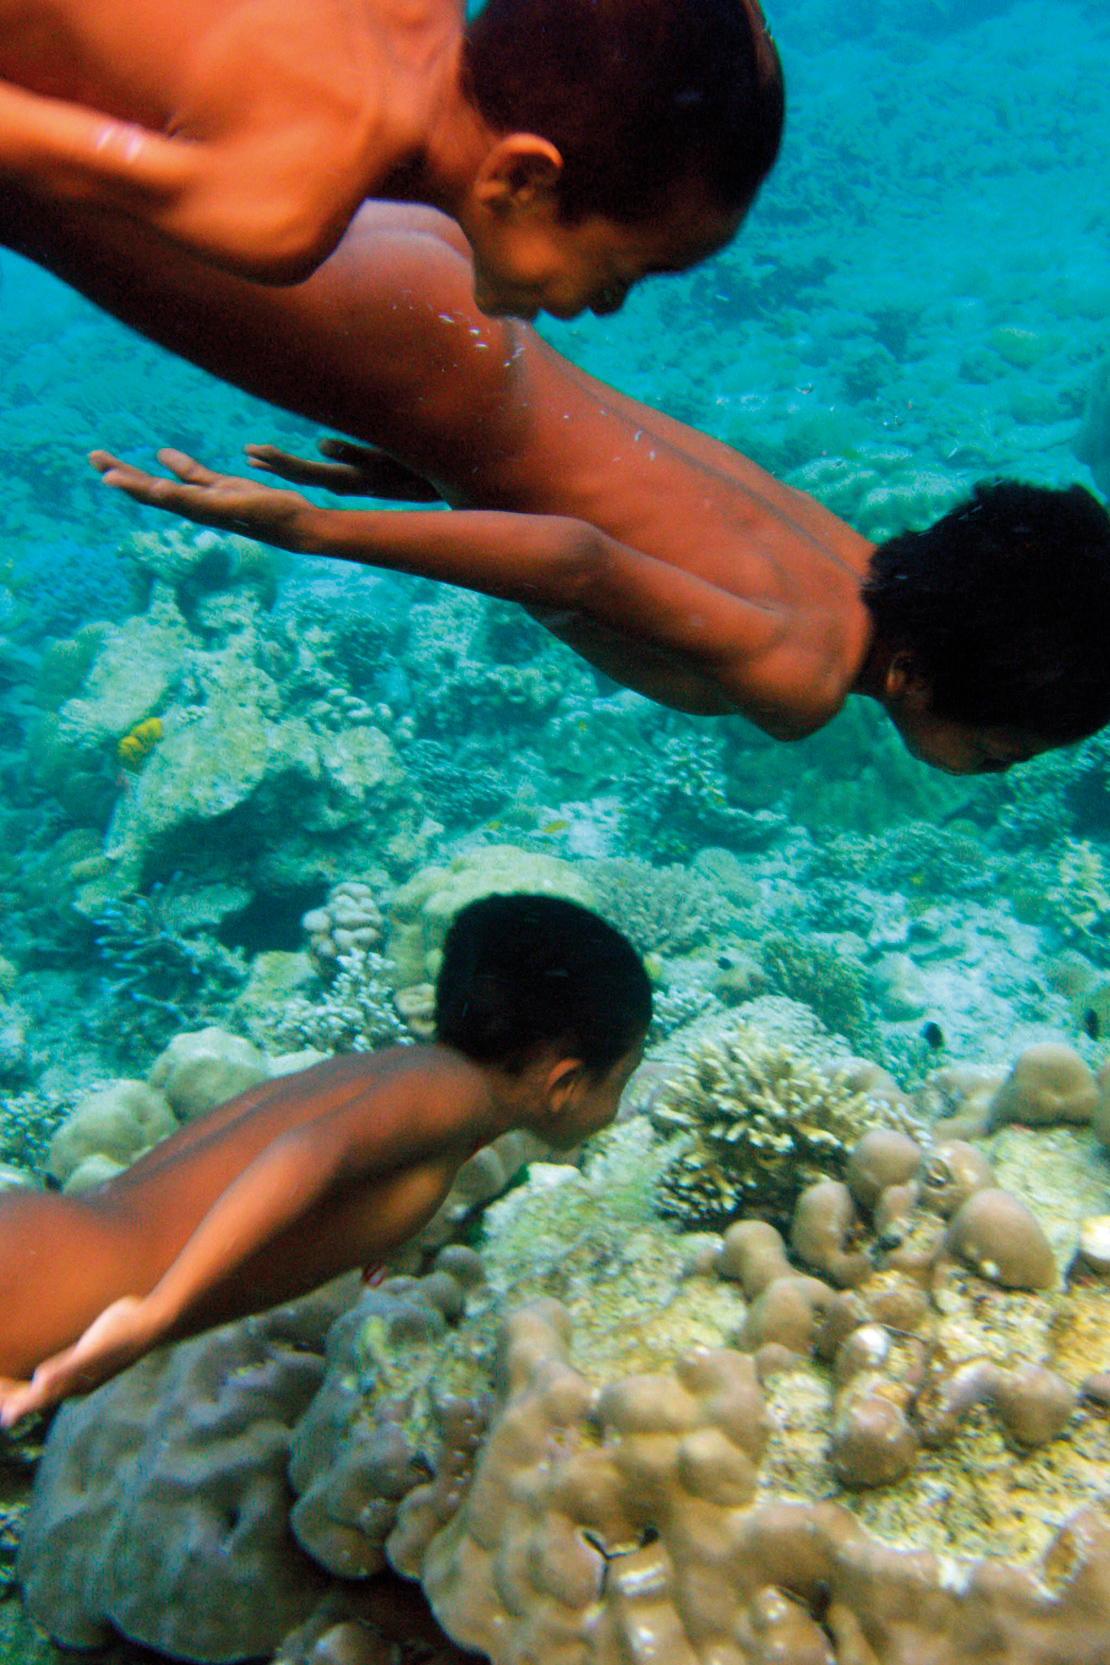 Indigenous Moken children swimming off the coast of Mu Ko Surin island, Thailand. Credit: Andrew Testa.